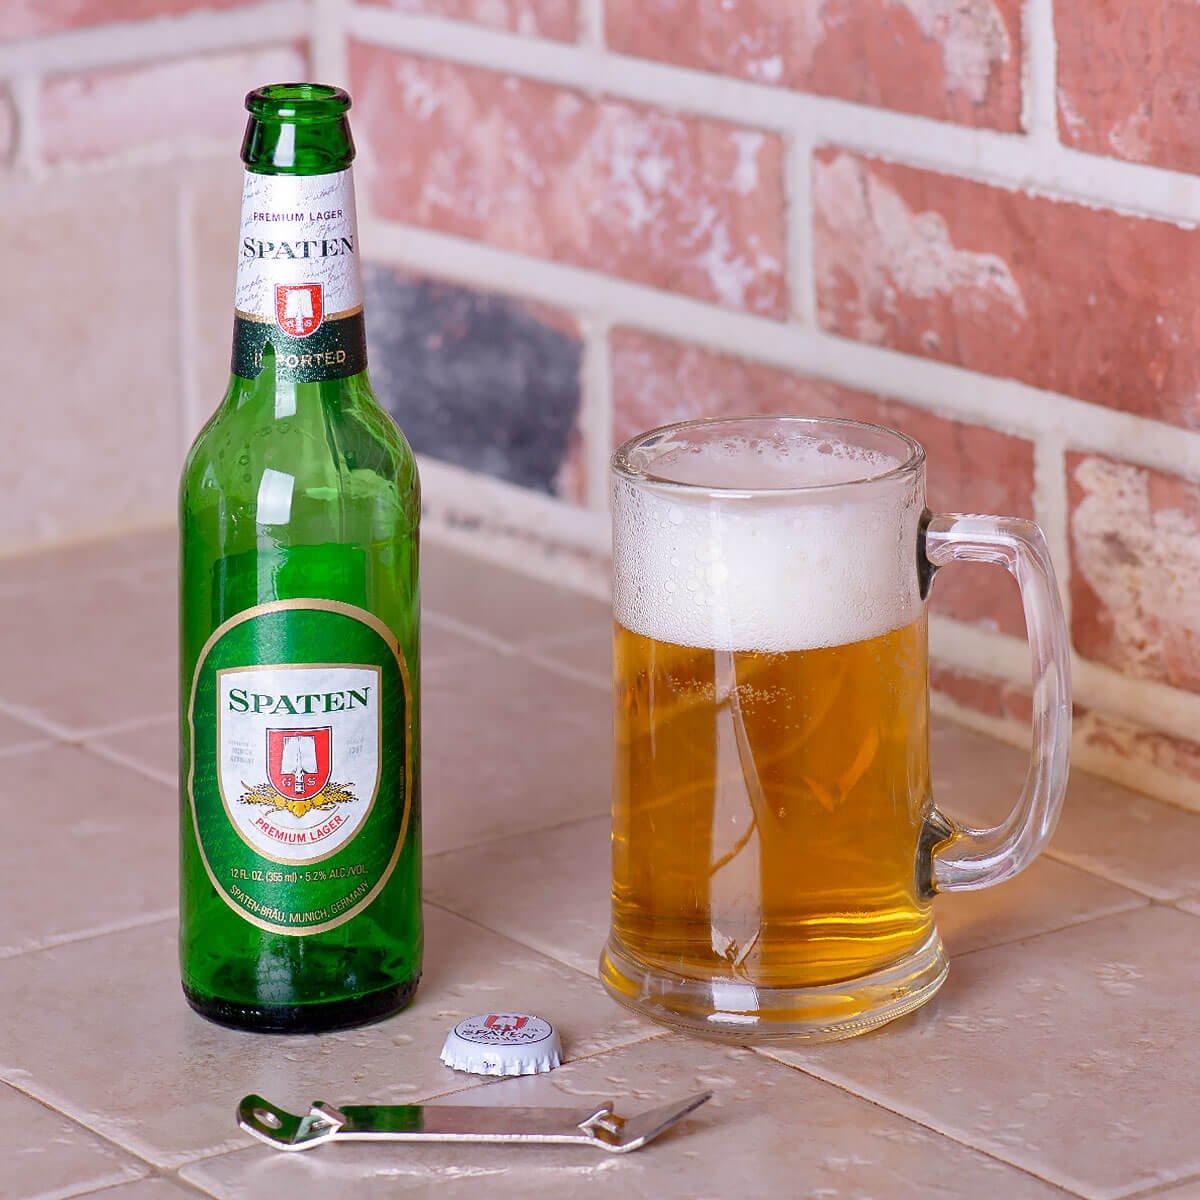 Spaten Premium Lager (Münchner Hell) is a Munich Helles Lager by Spaten-Franziskaner-Bräu that balances cracker malt and noble hops.